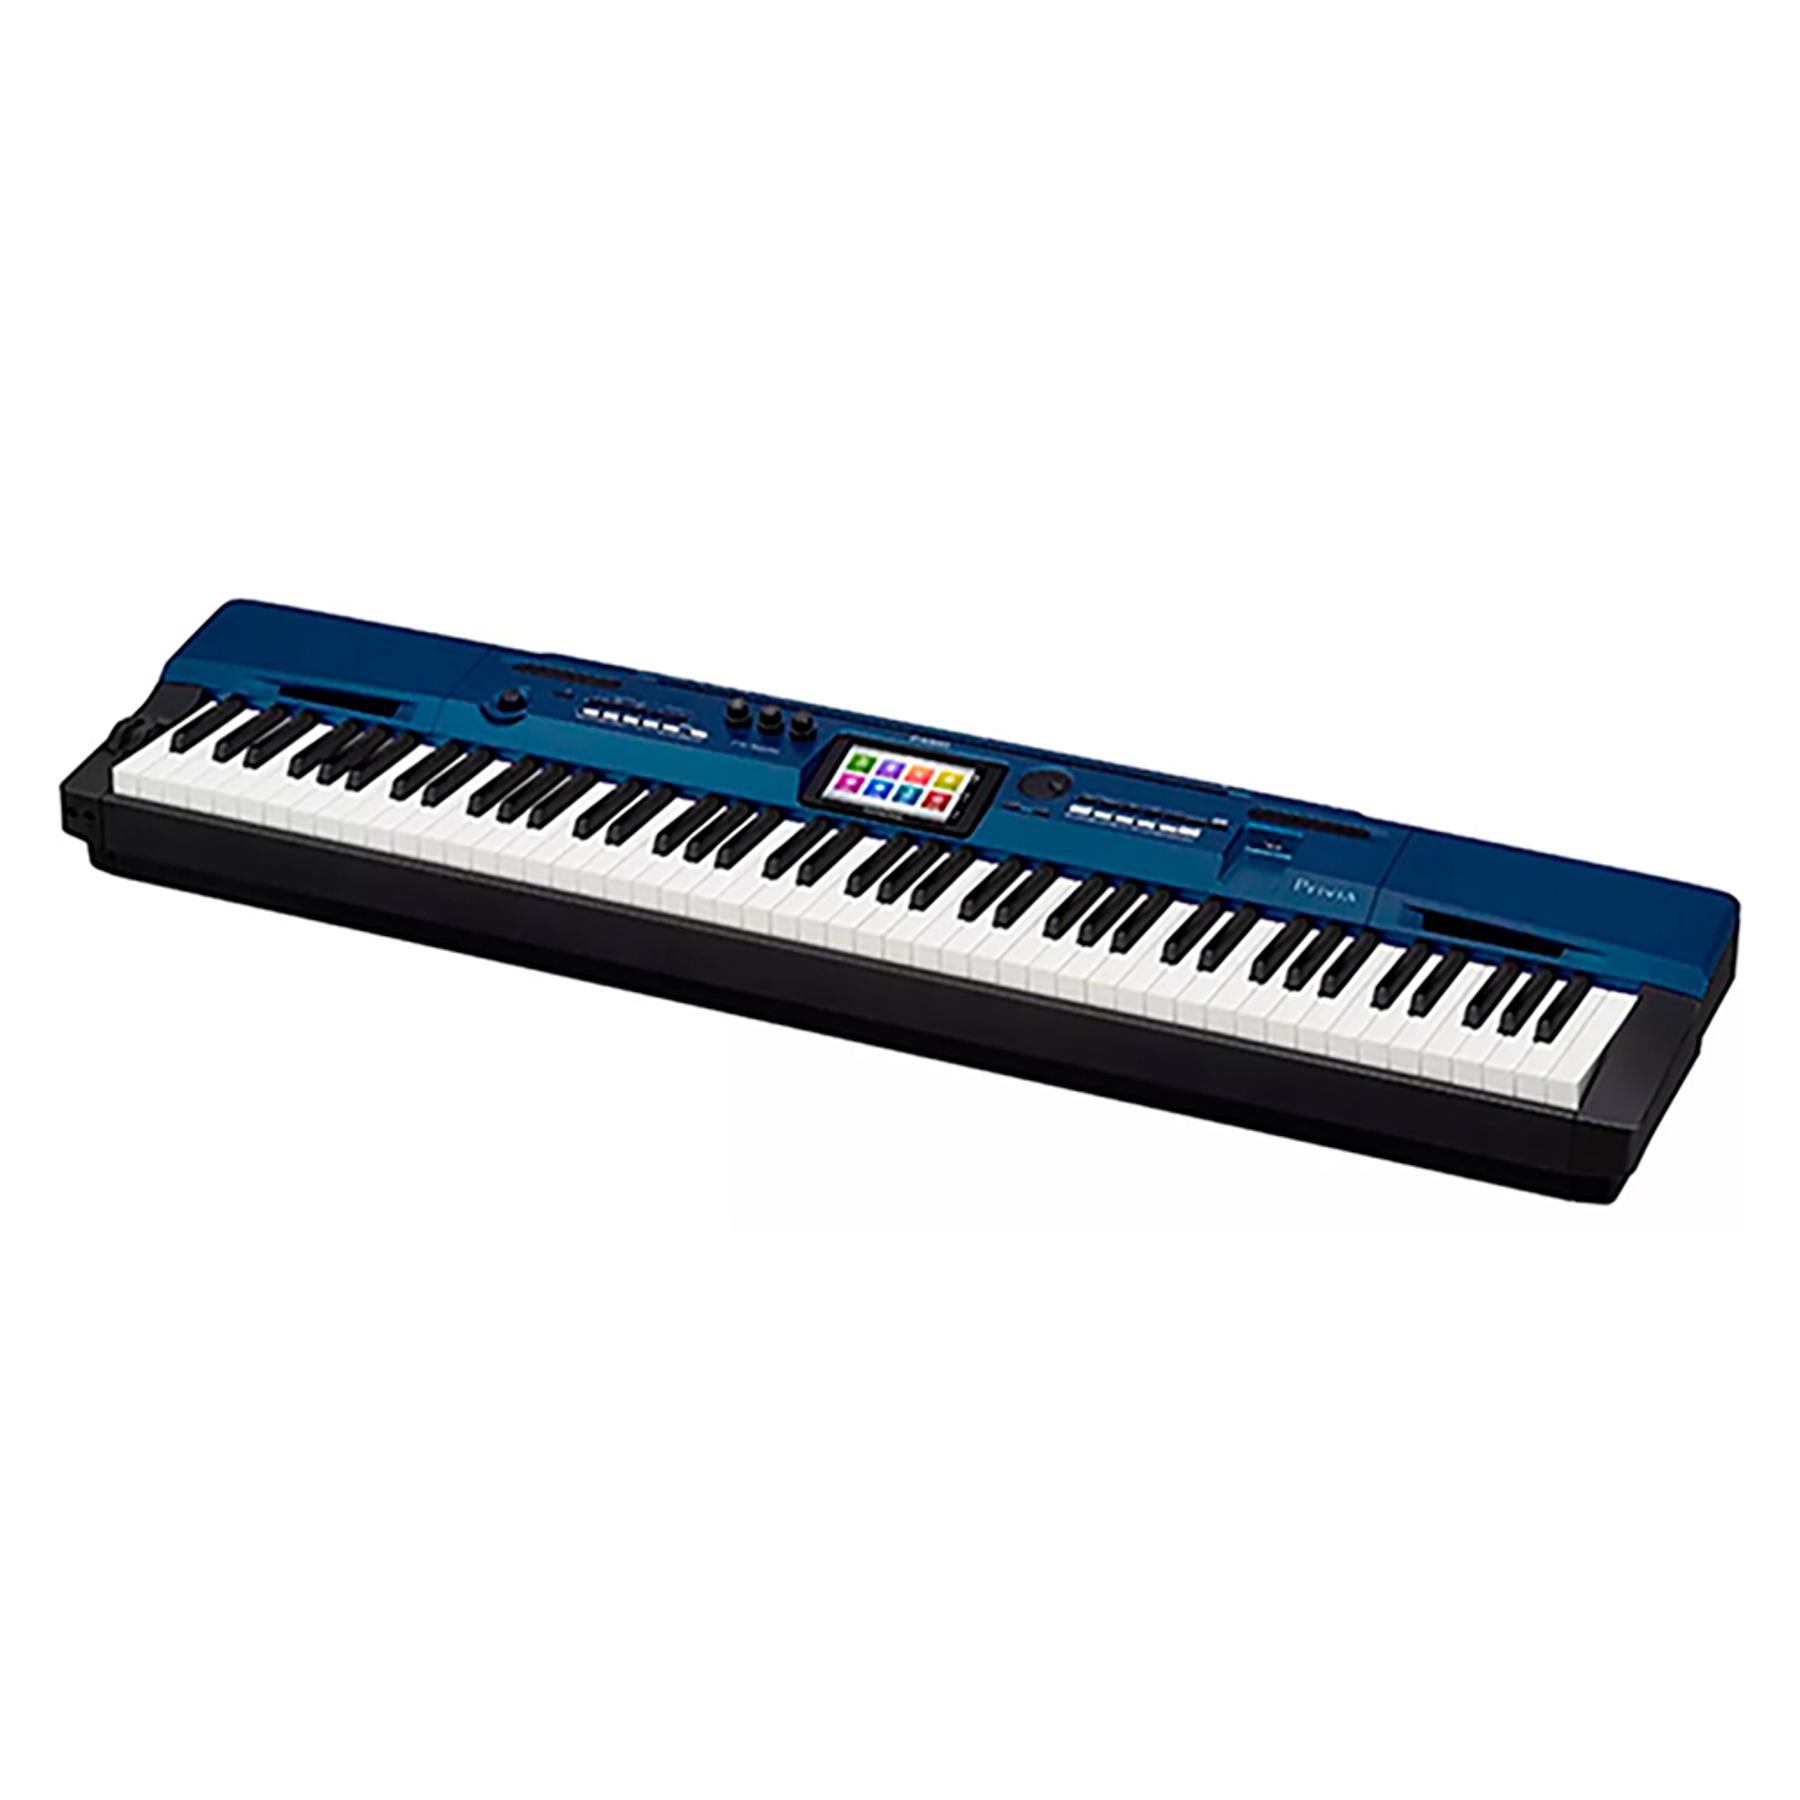 Piano digital PX-560M Casio